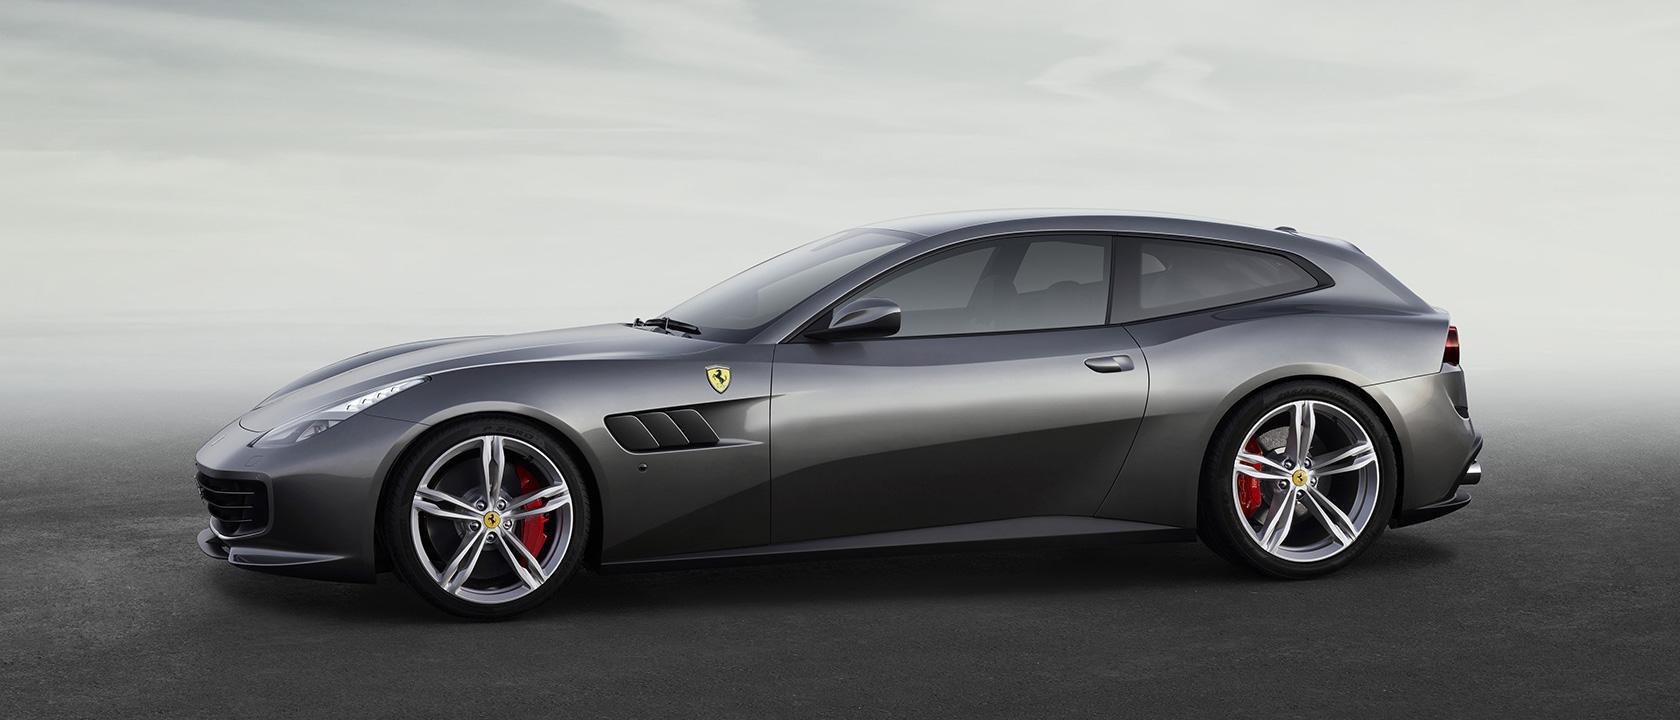 This Gtc4lusso Is Ferrari S Idea Of A Practical Family Car Slashgear